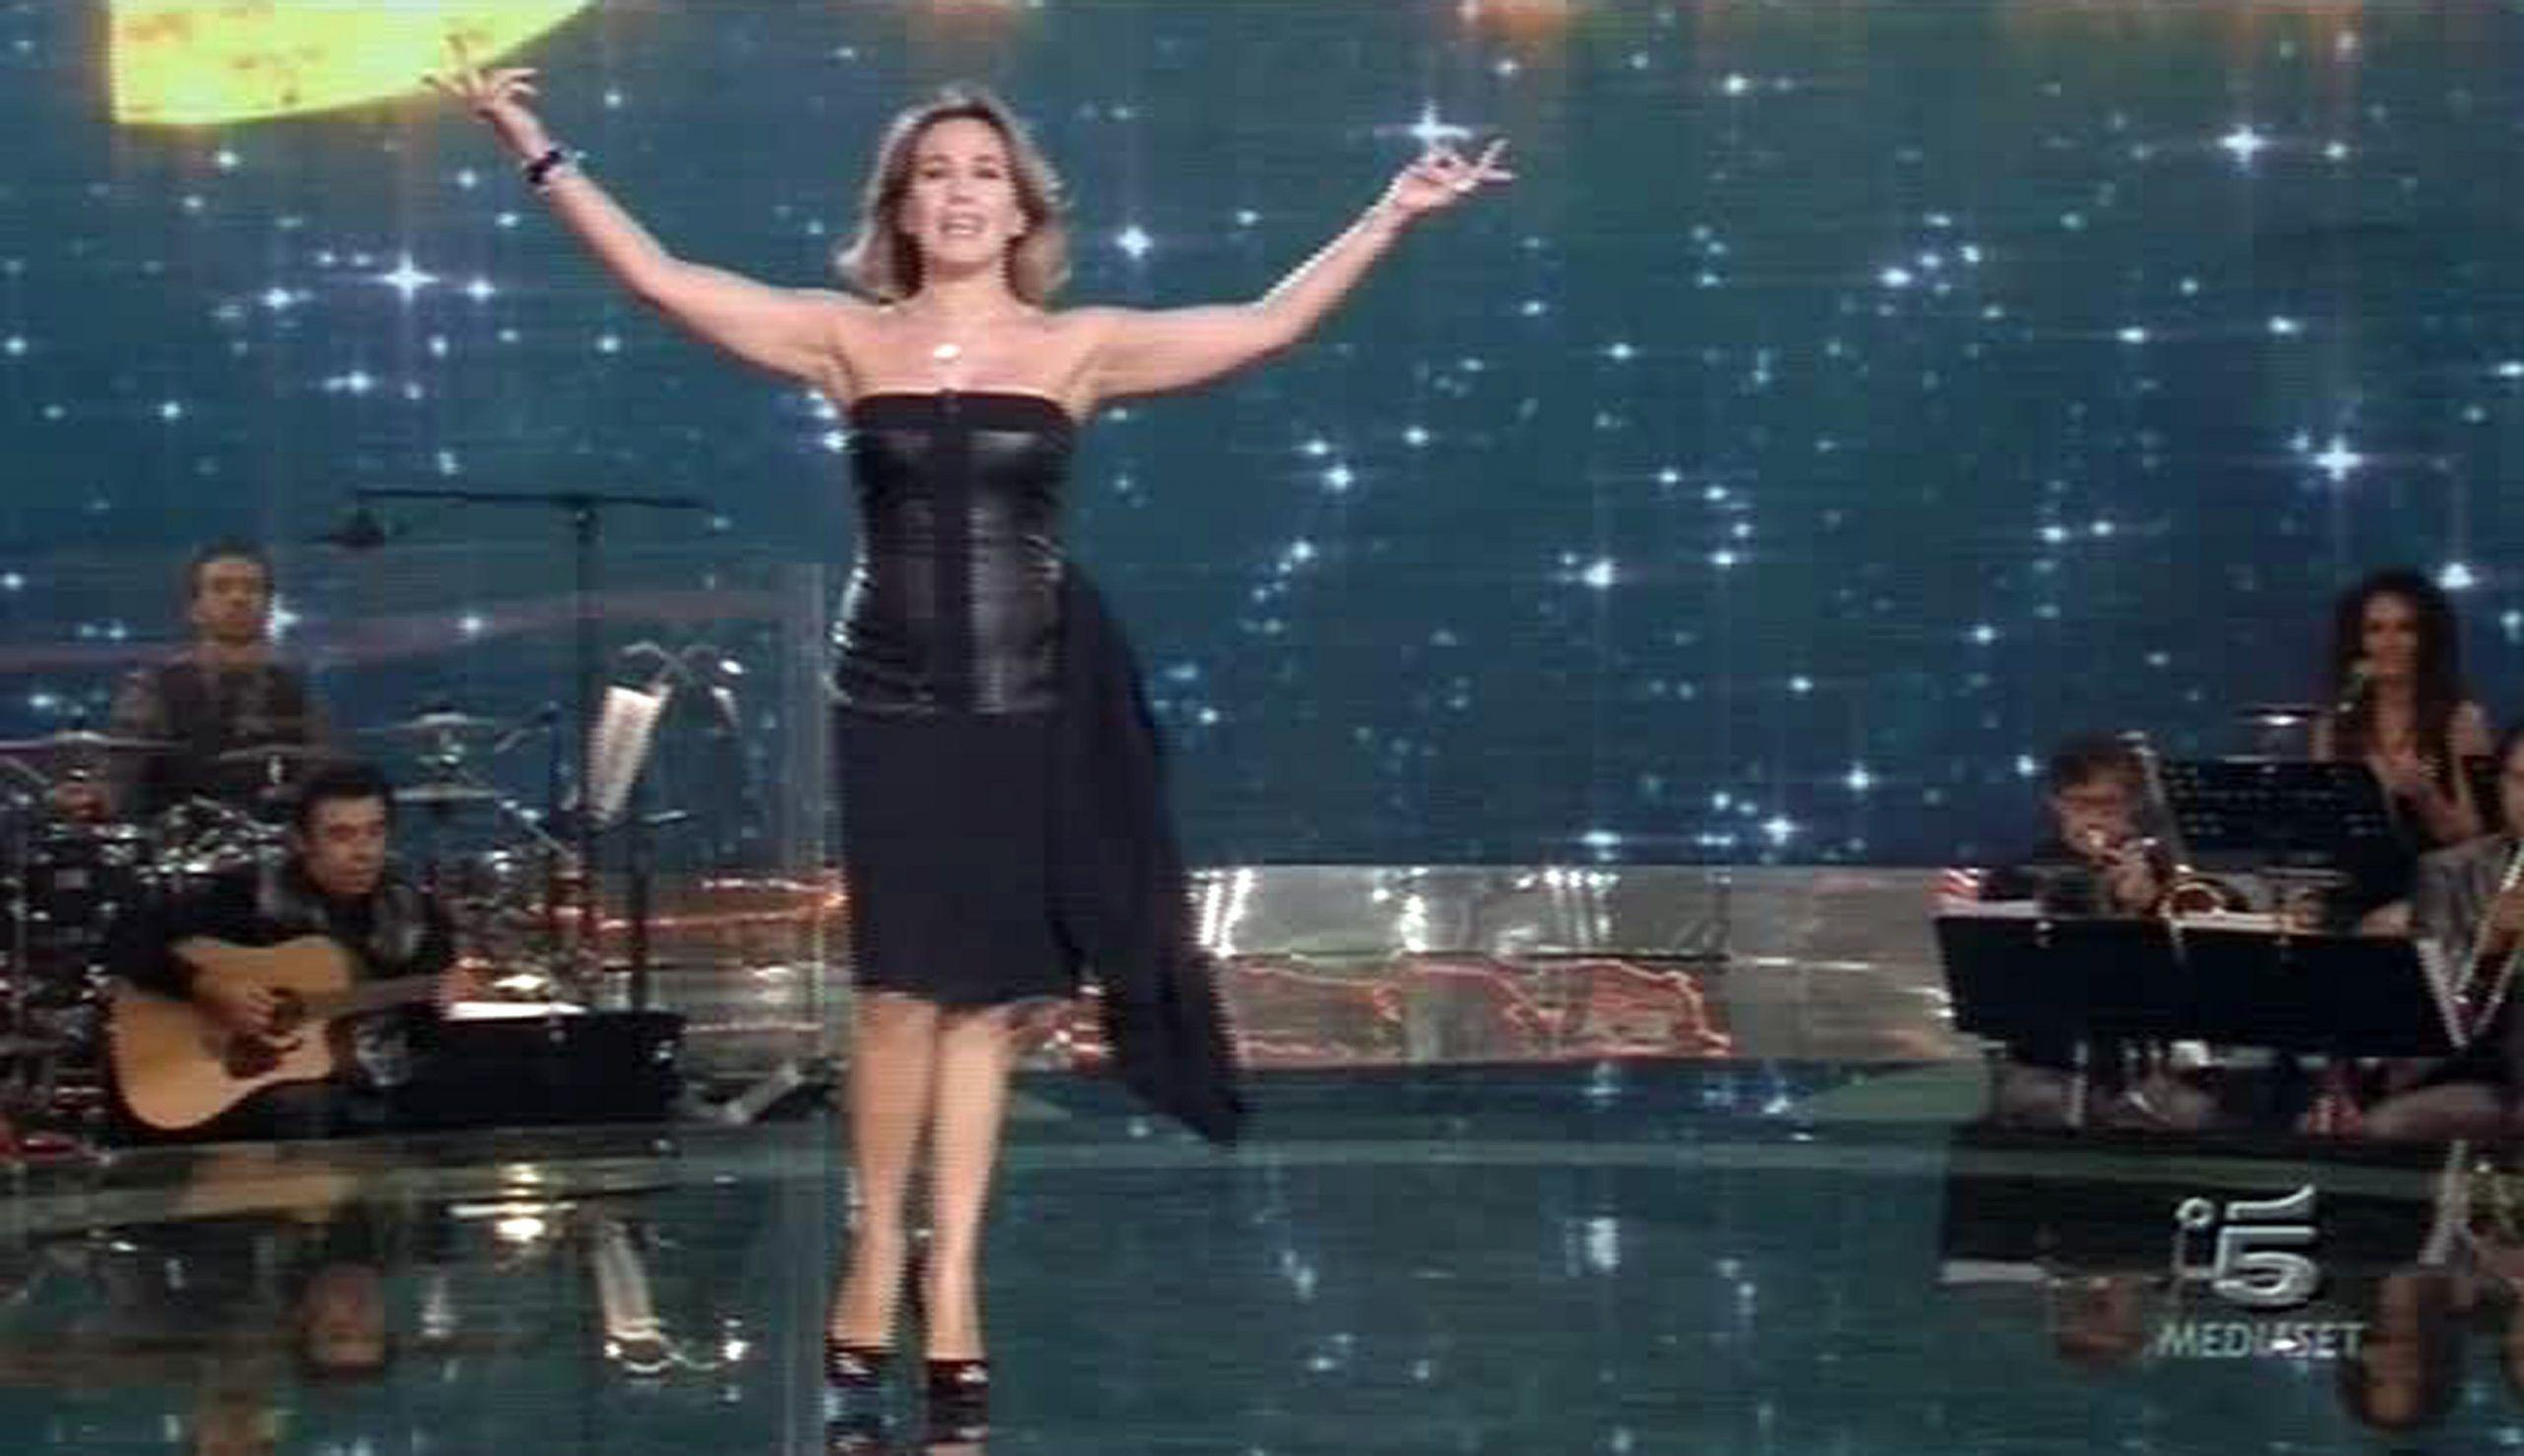 TV: BAILA!, BARBARA D'URSO 'EVVIVA SIAMO IN ONDA'